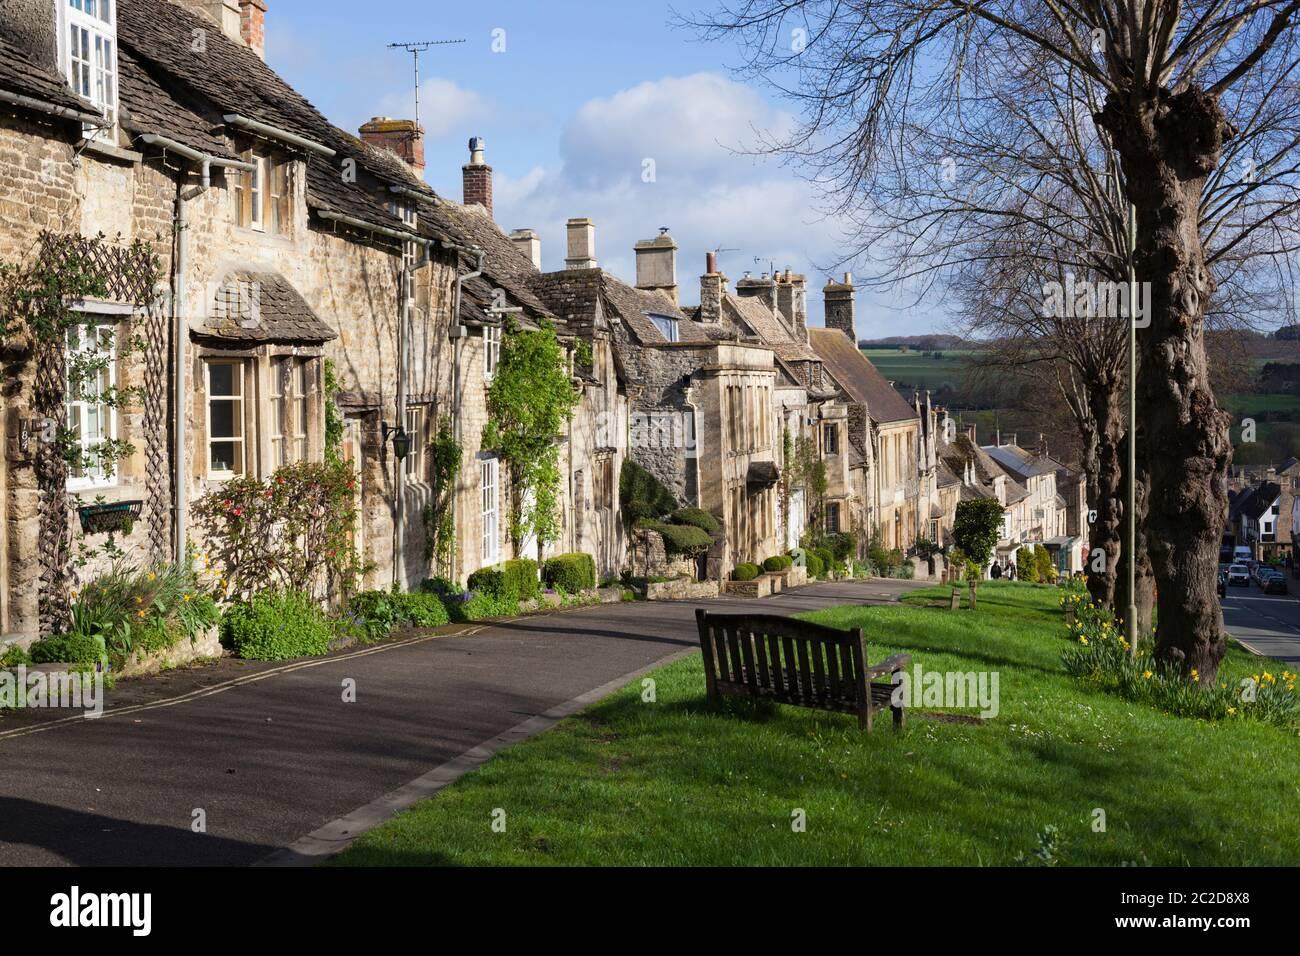 Cotswold cottage lungo la collina, burford, Cotswolds, Oxfordshire, England, Regno Unito, Europa Foto Stock